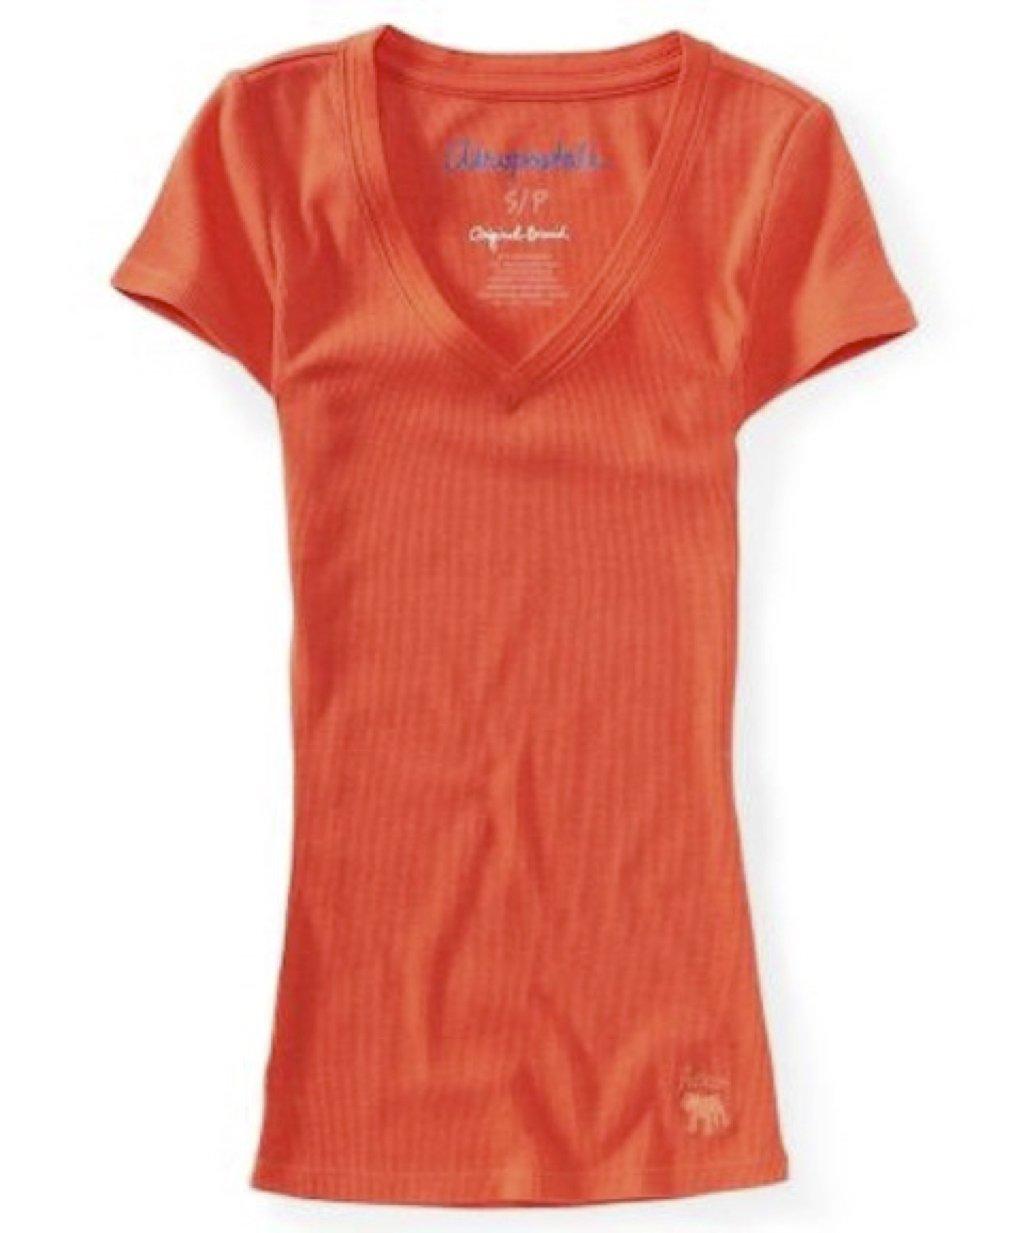 Aeropostale Womens V-Neck Stretch Ribbed Solid T-Shirt Orange Large